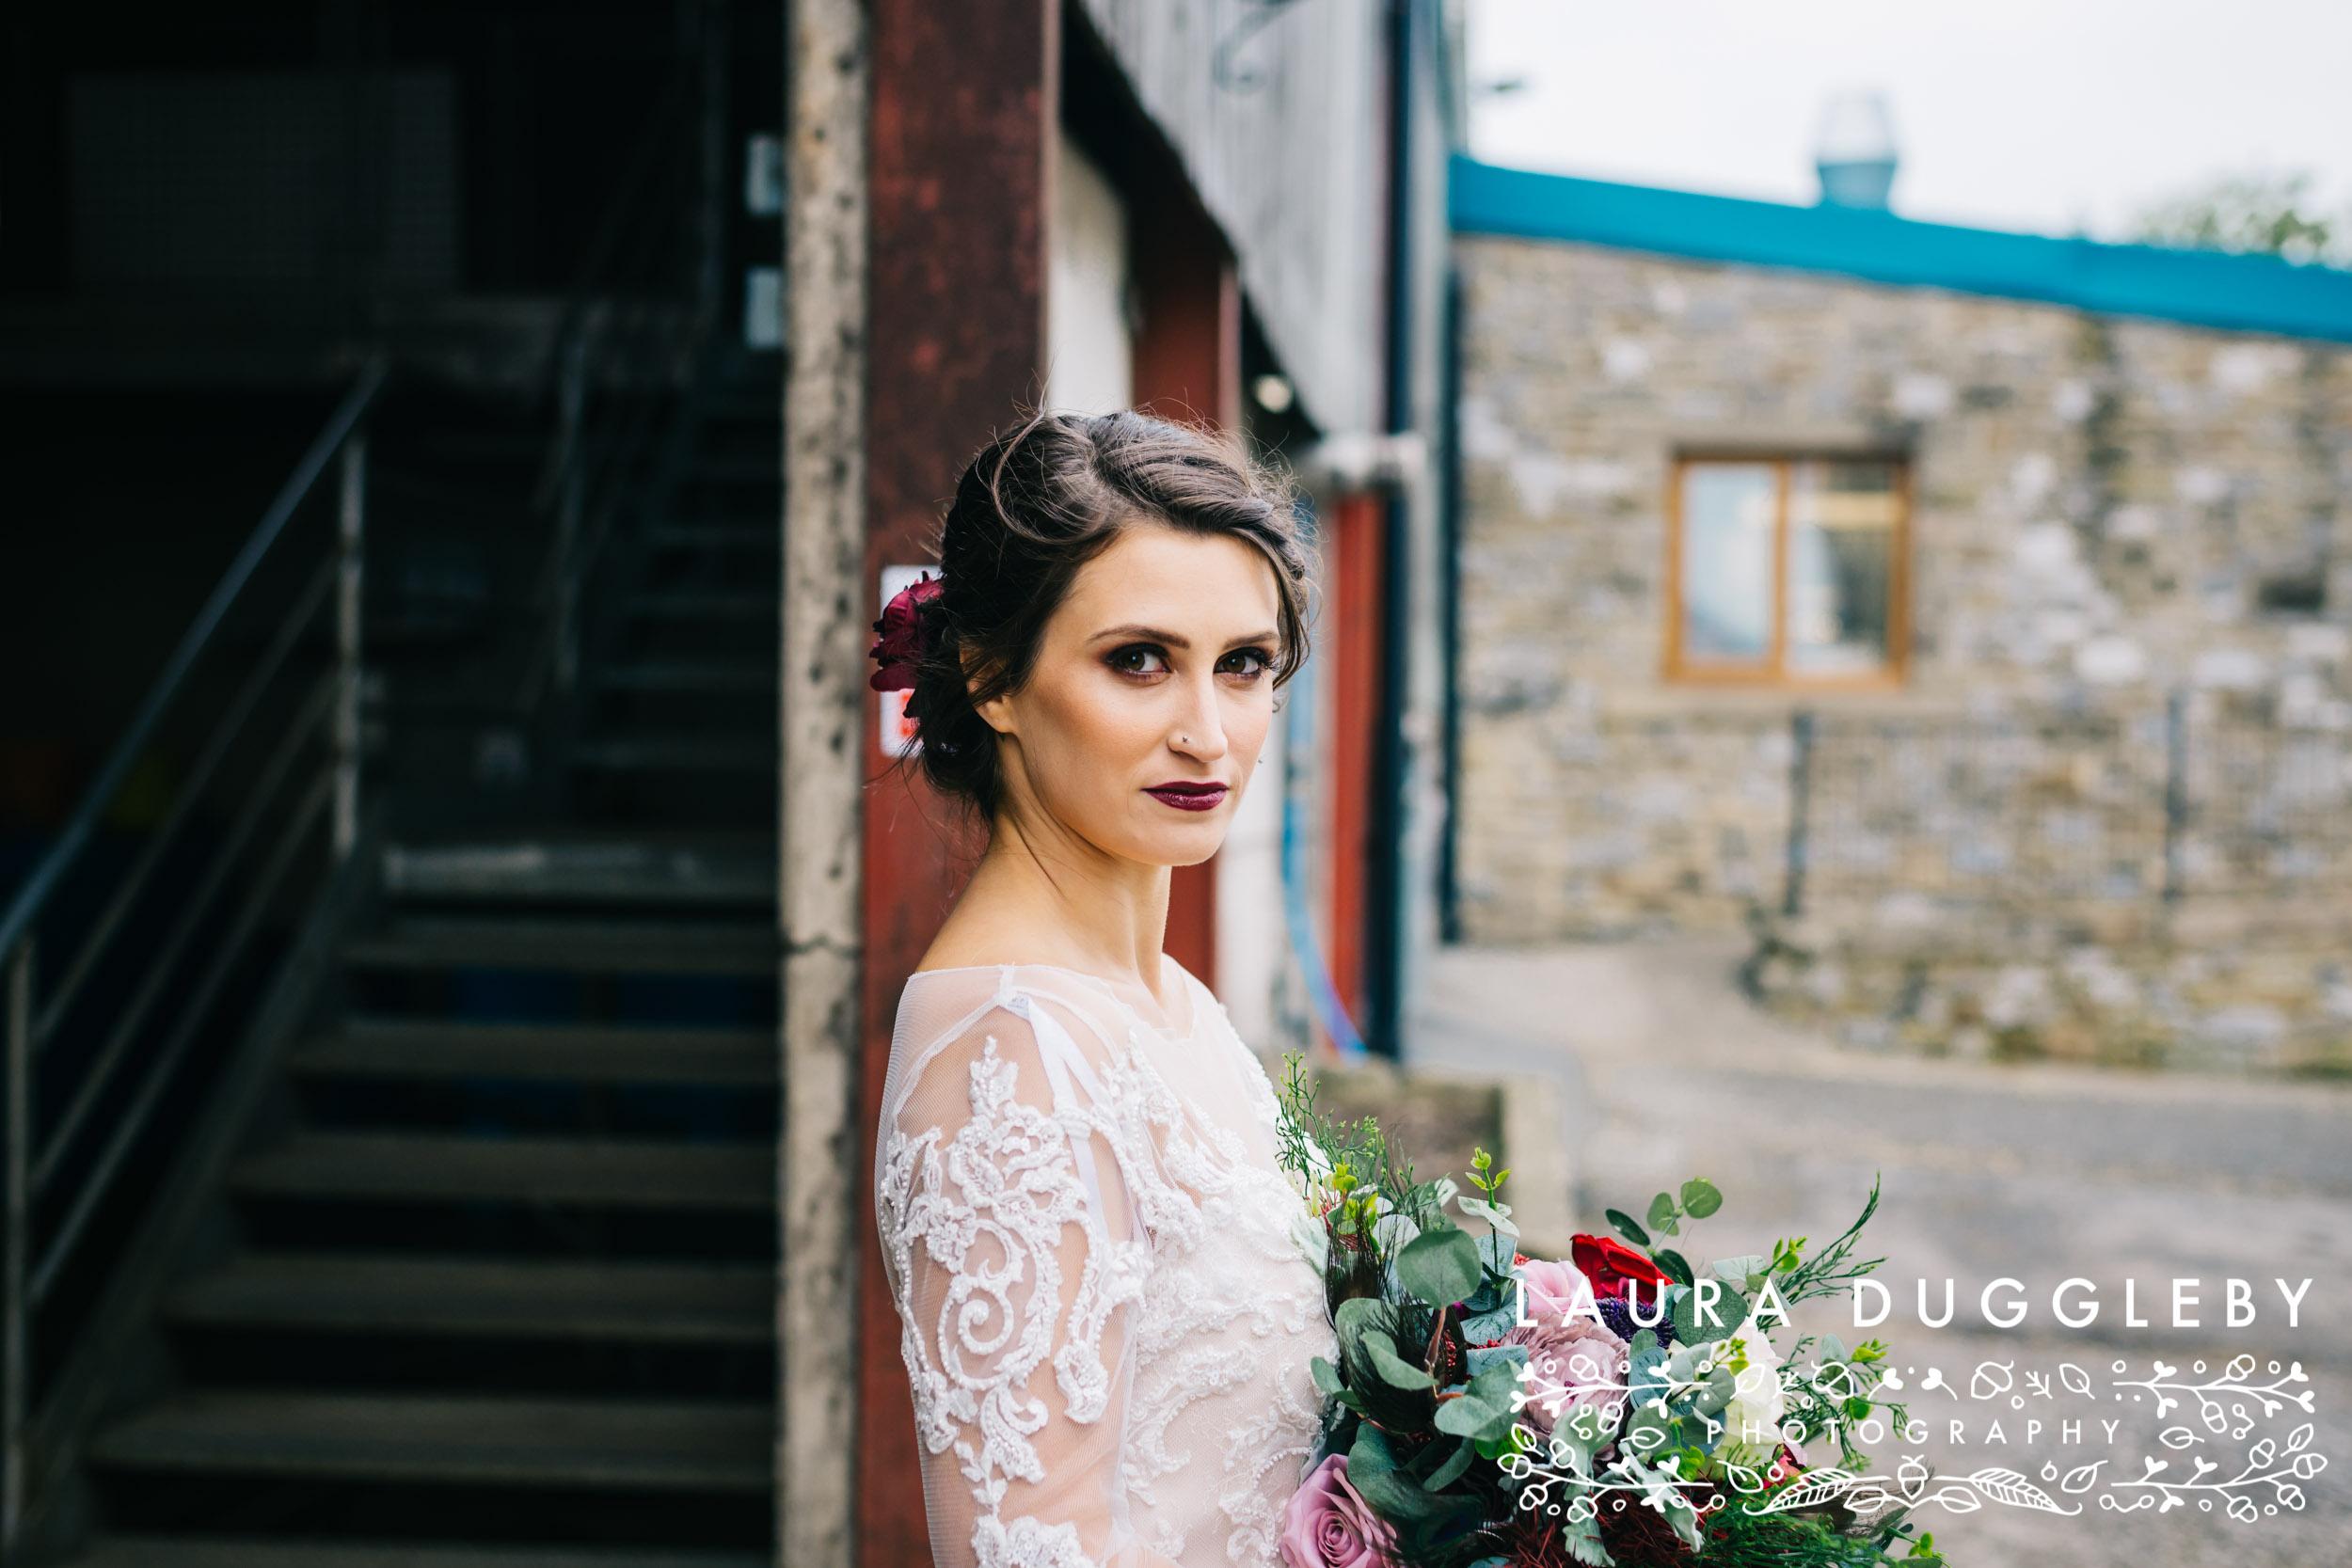 Skipton Wedding Photographer - Thornton Hall Country Park Wedding Photographer7